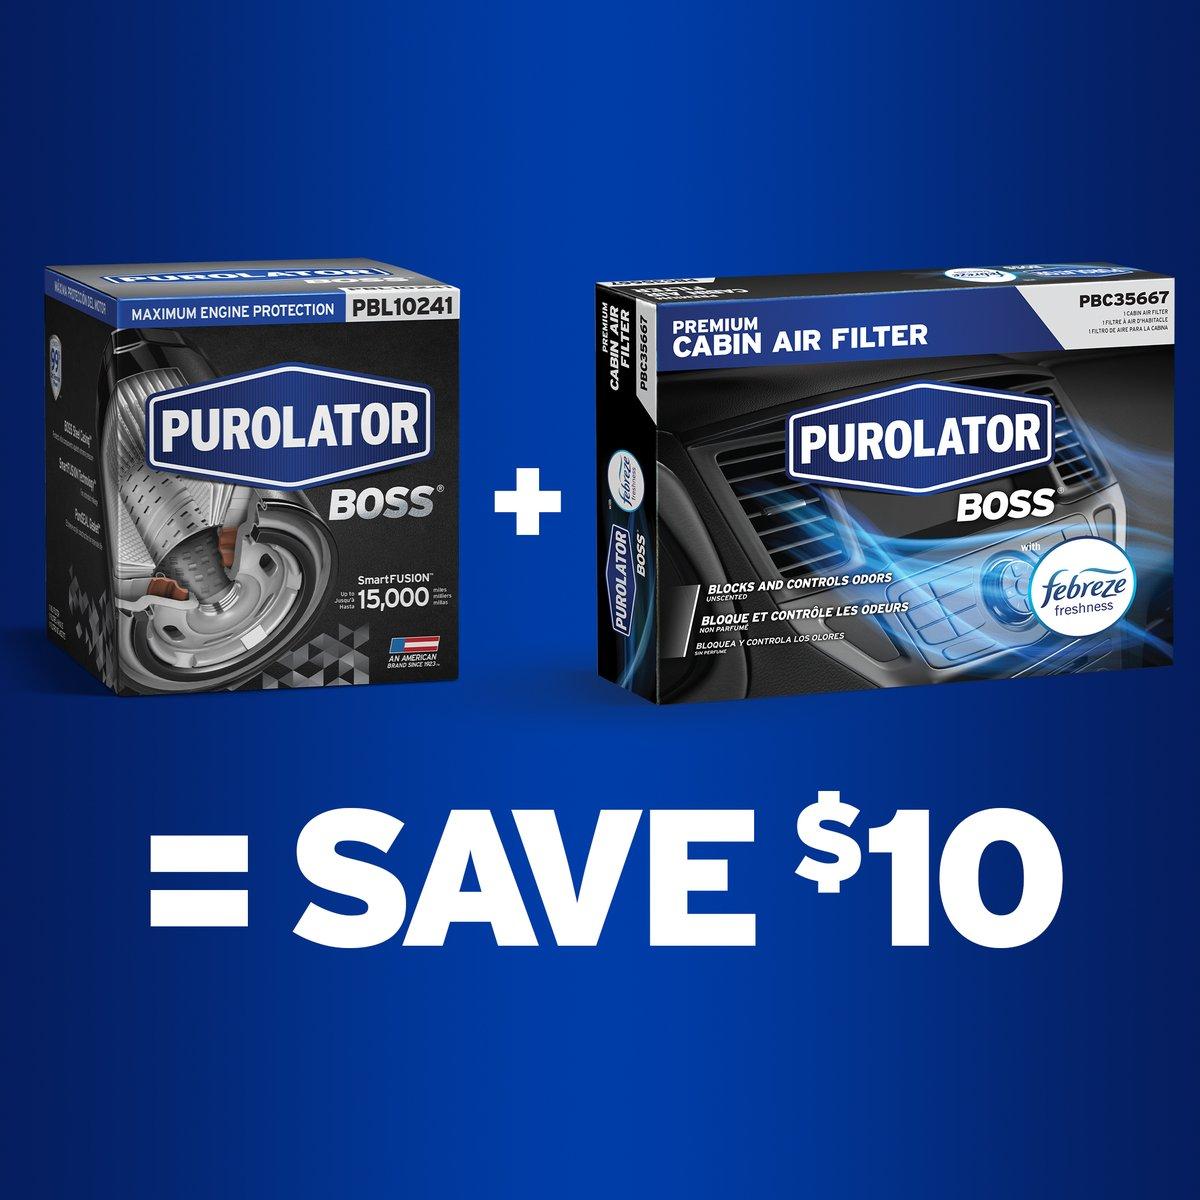 Score $10 when you buy a PurolatorBOSS Premium Oil Filter and a PurolatorBOSS Premium Cabin Air Filter with Febreze Freshness from Advance Auto Parts or Carquest Auto Parts. Click for details:  https://t.co/TgDOhhrBNd https://t.co/3KmFkkZuzf